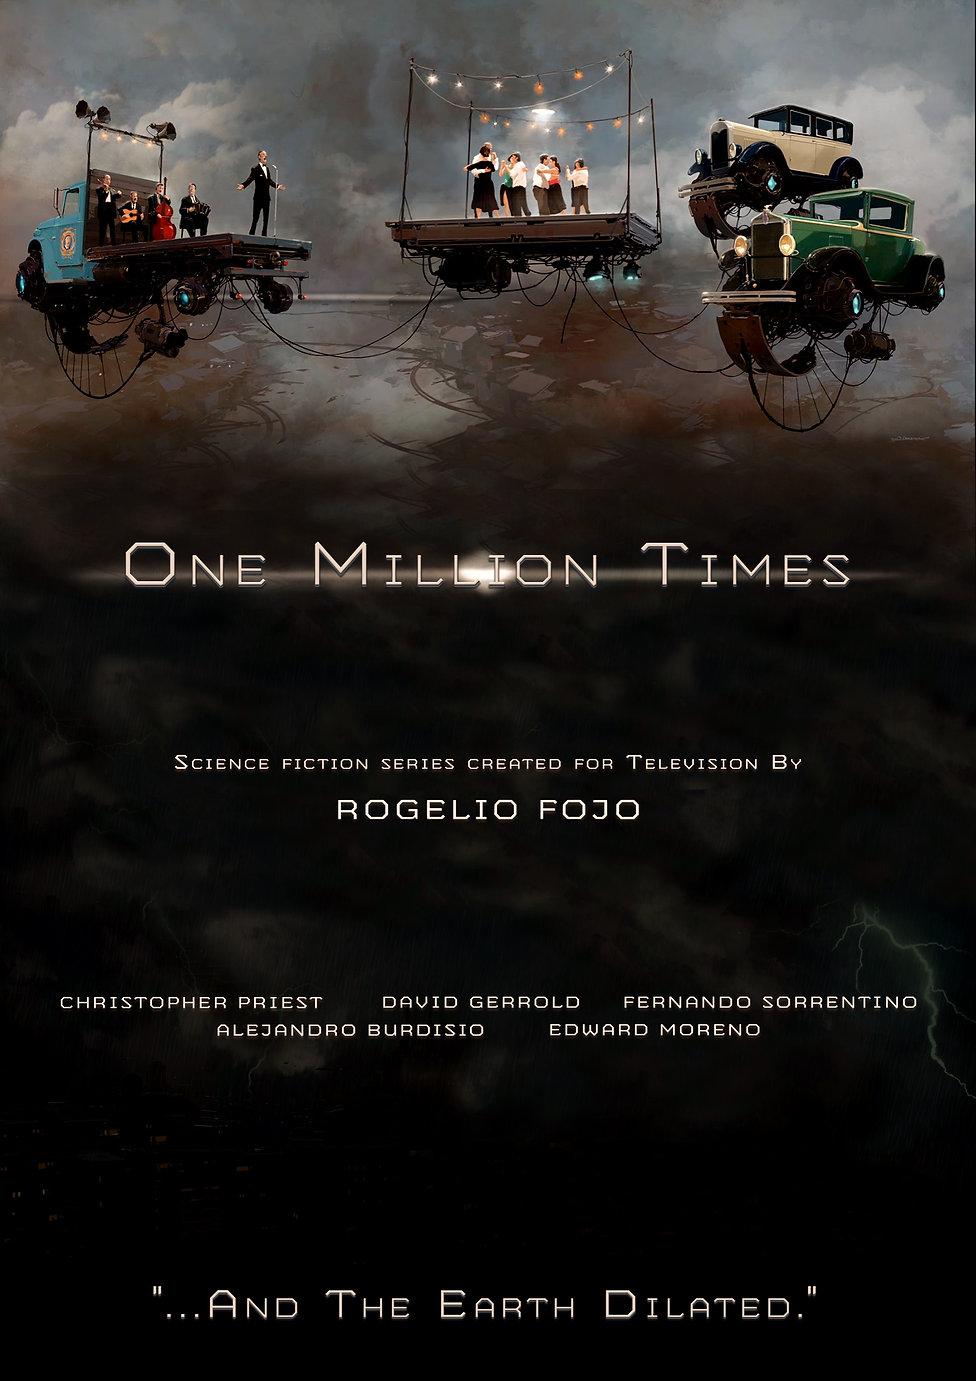 Fojo-One-Million-Times-Poster_edited_edi